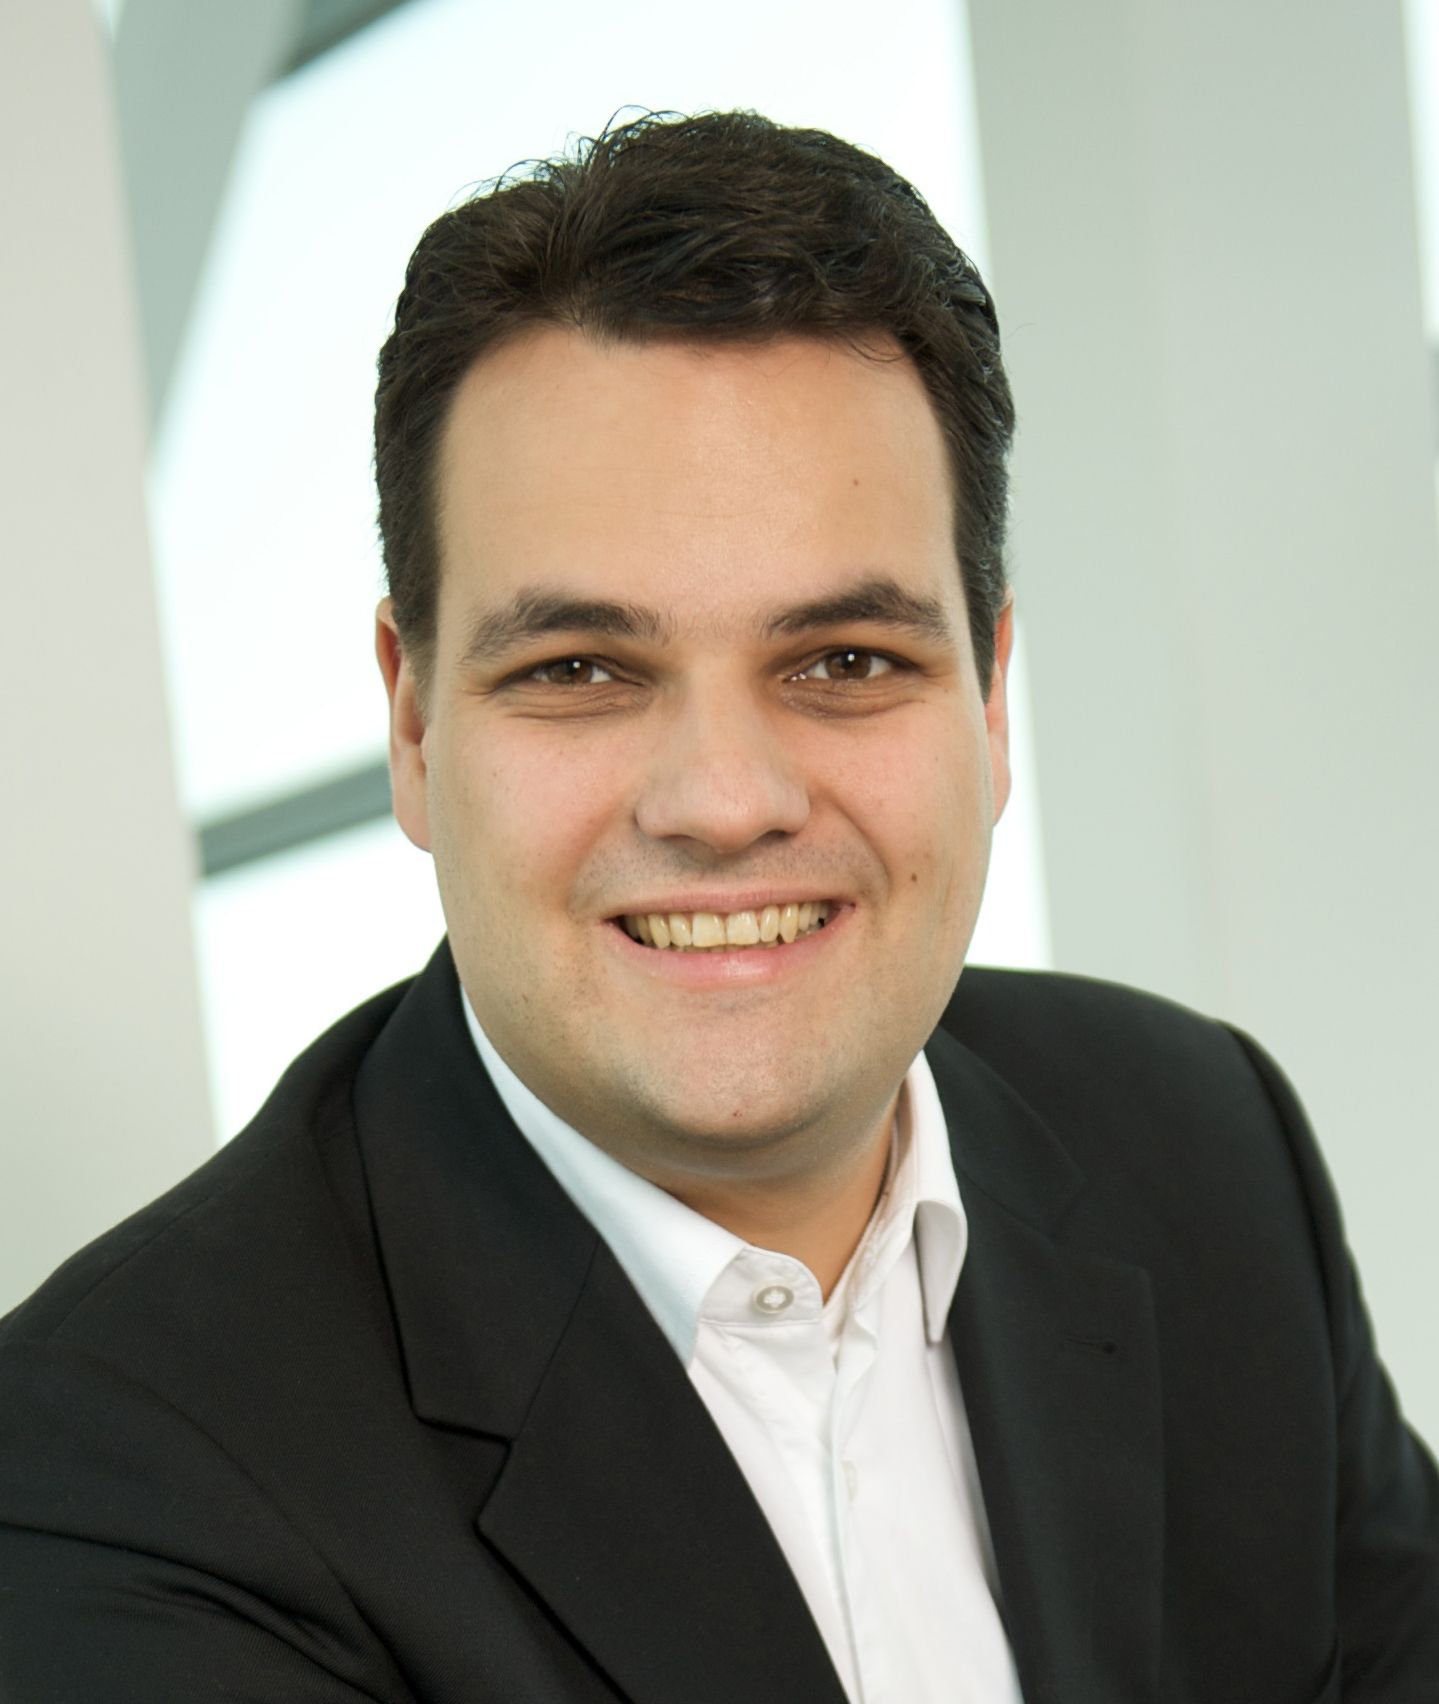 Marc-Michael Blum